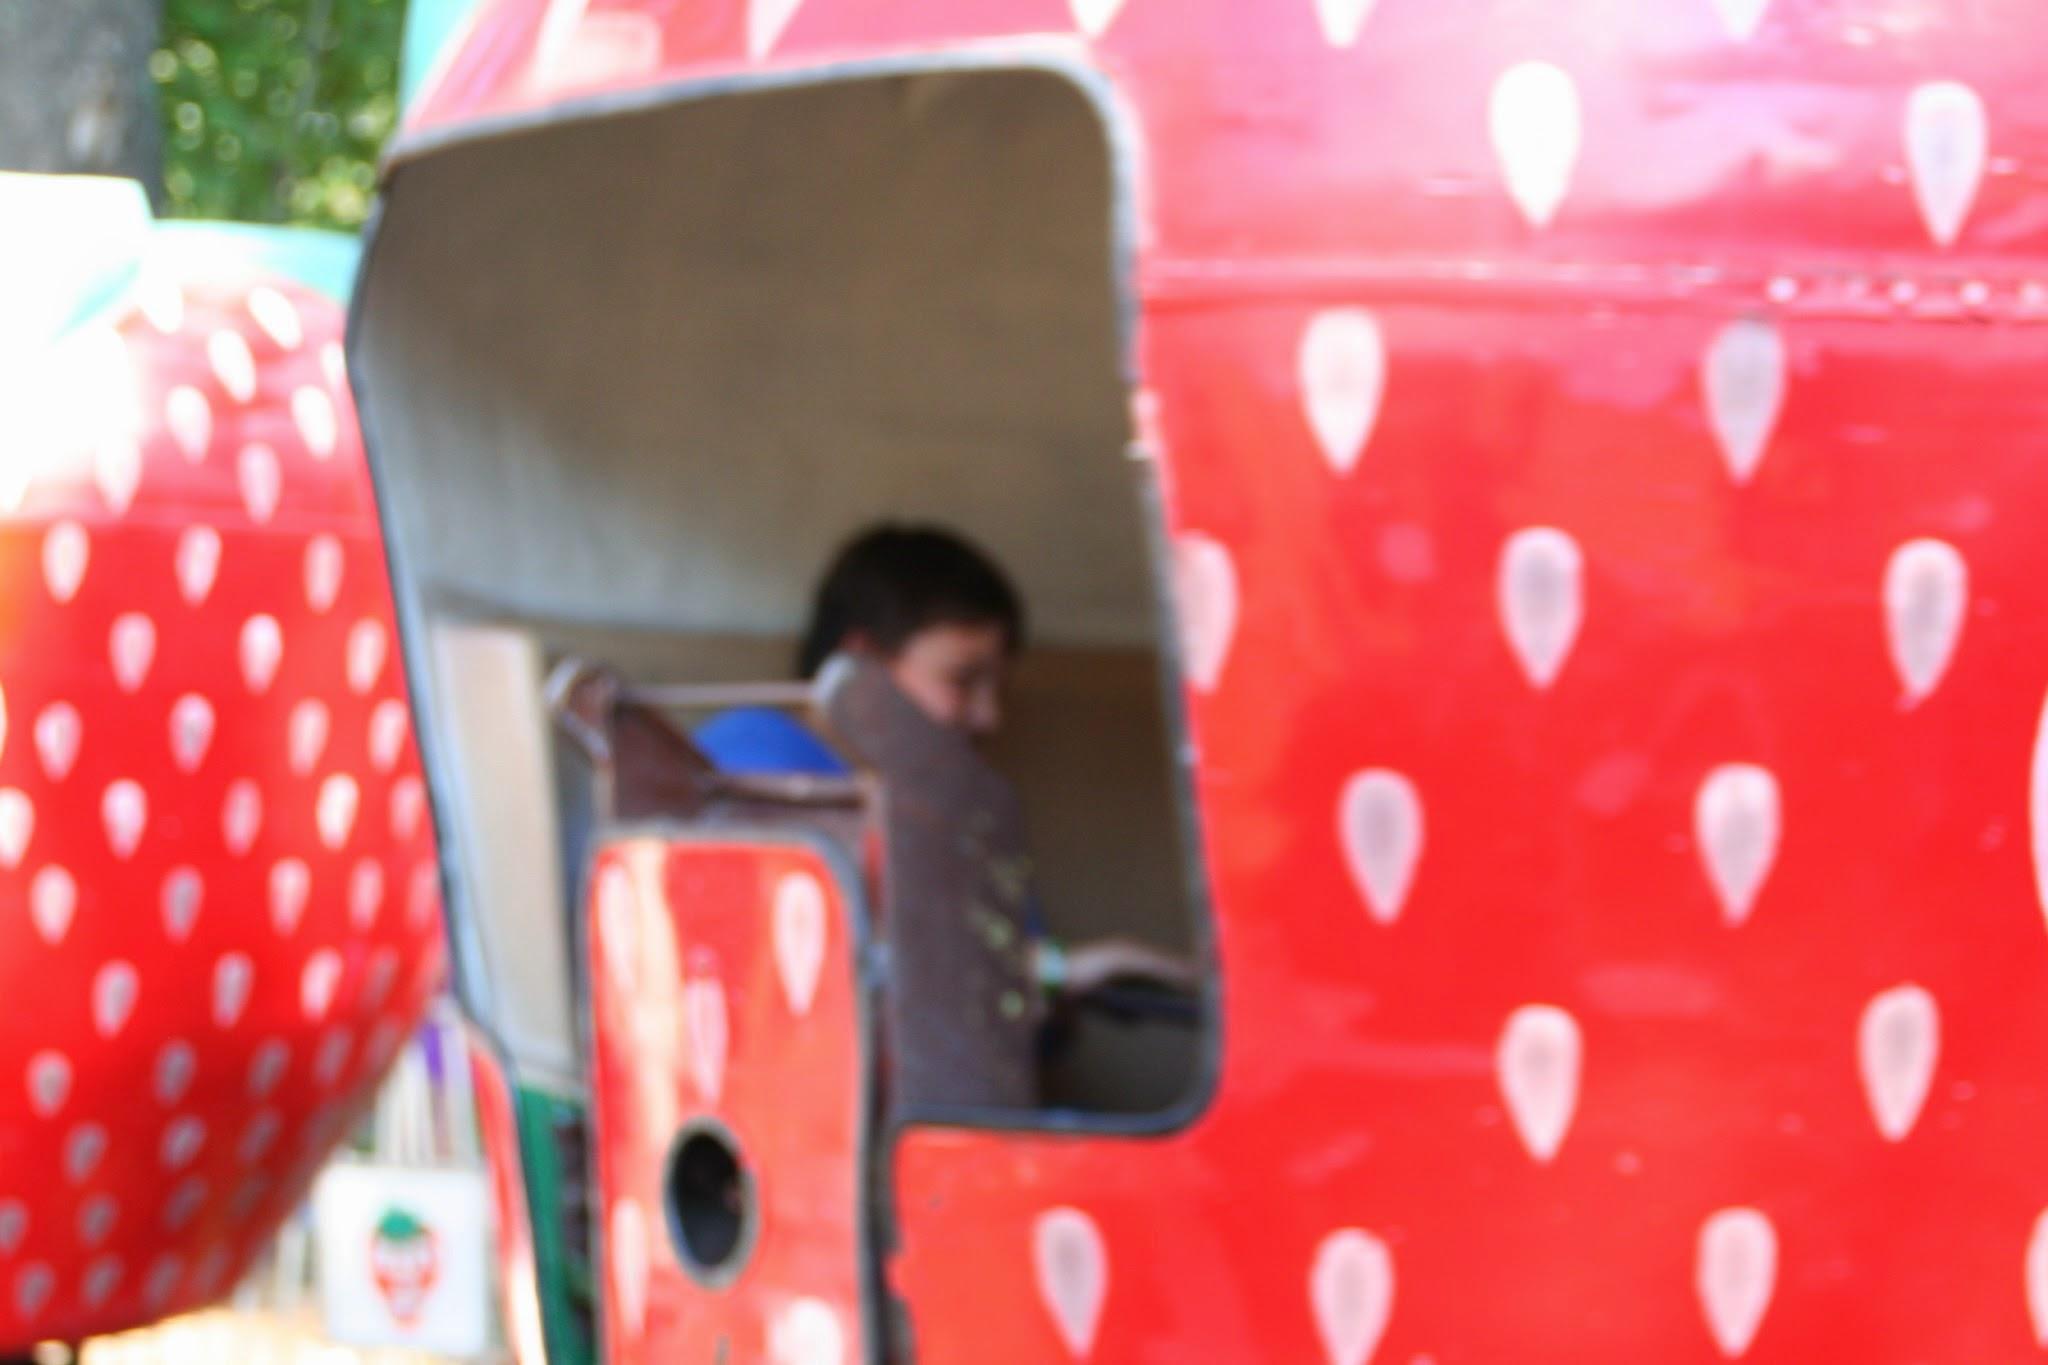 carnival-rides-25